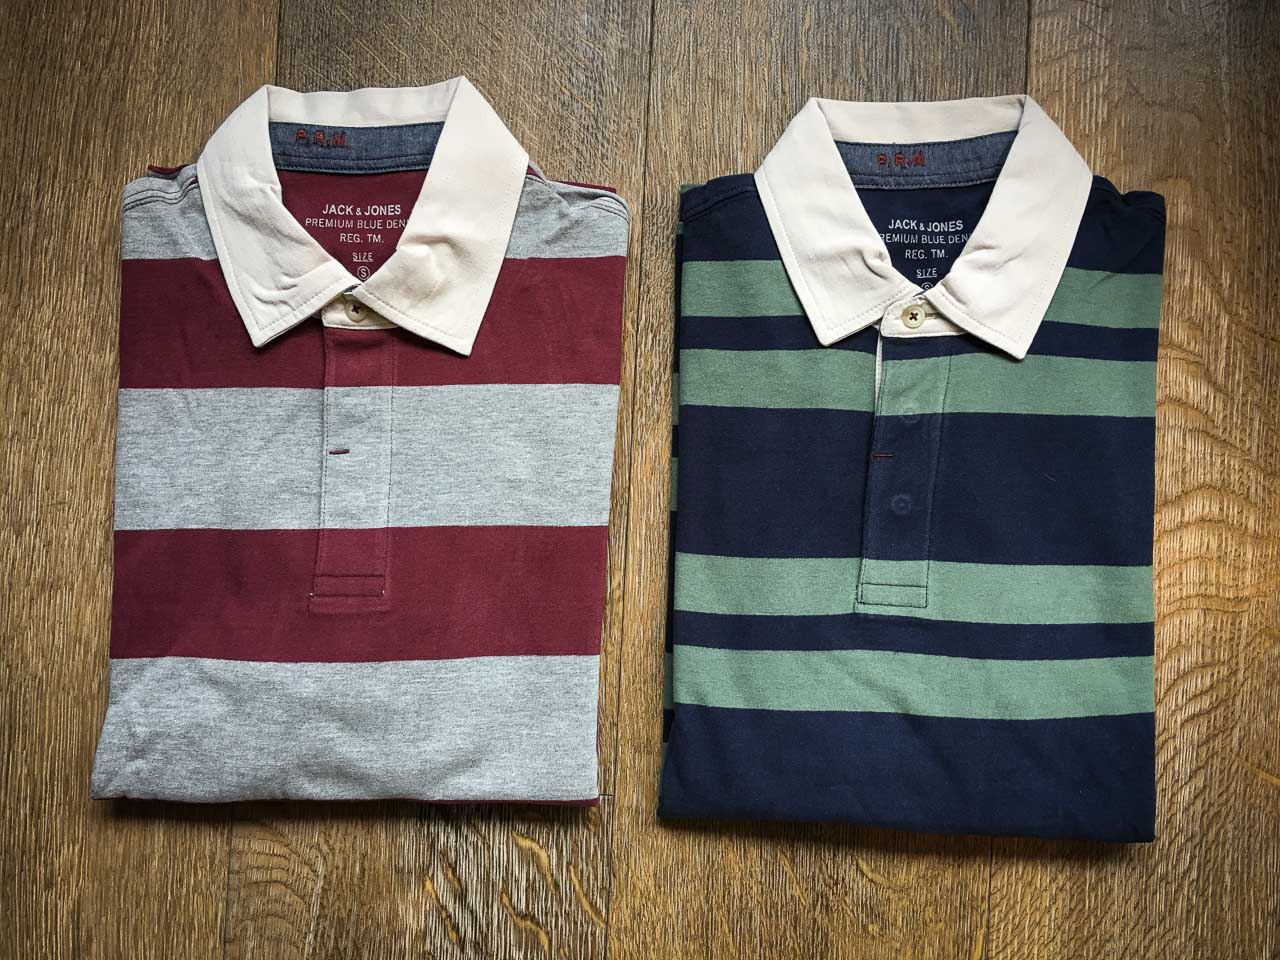 Jack & Jones Poloshirts